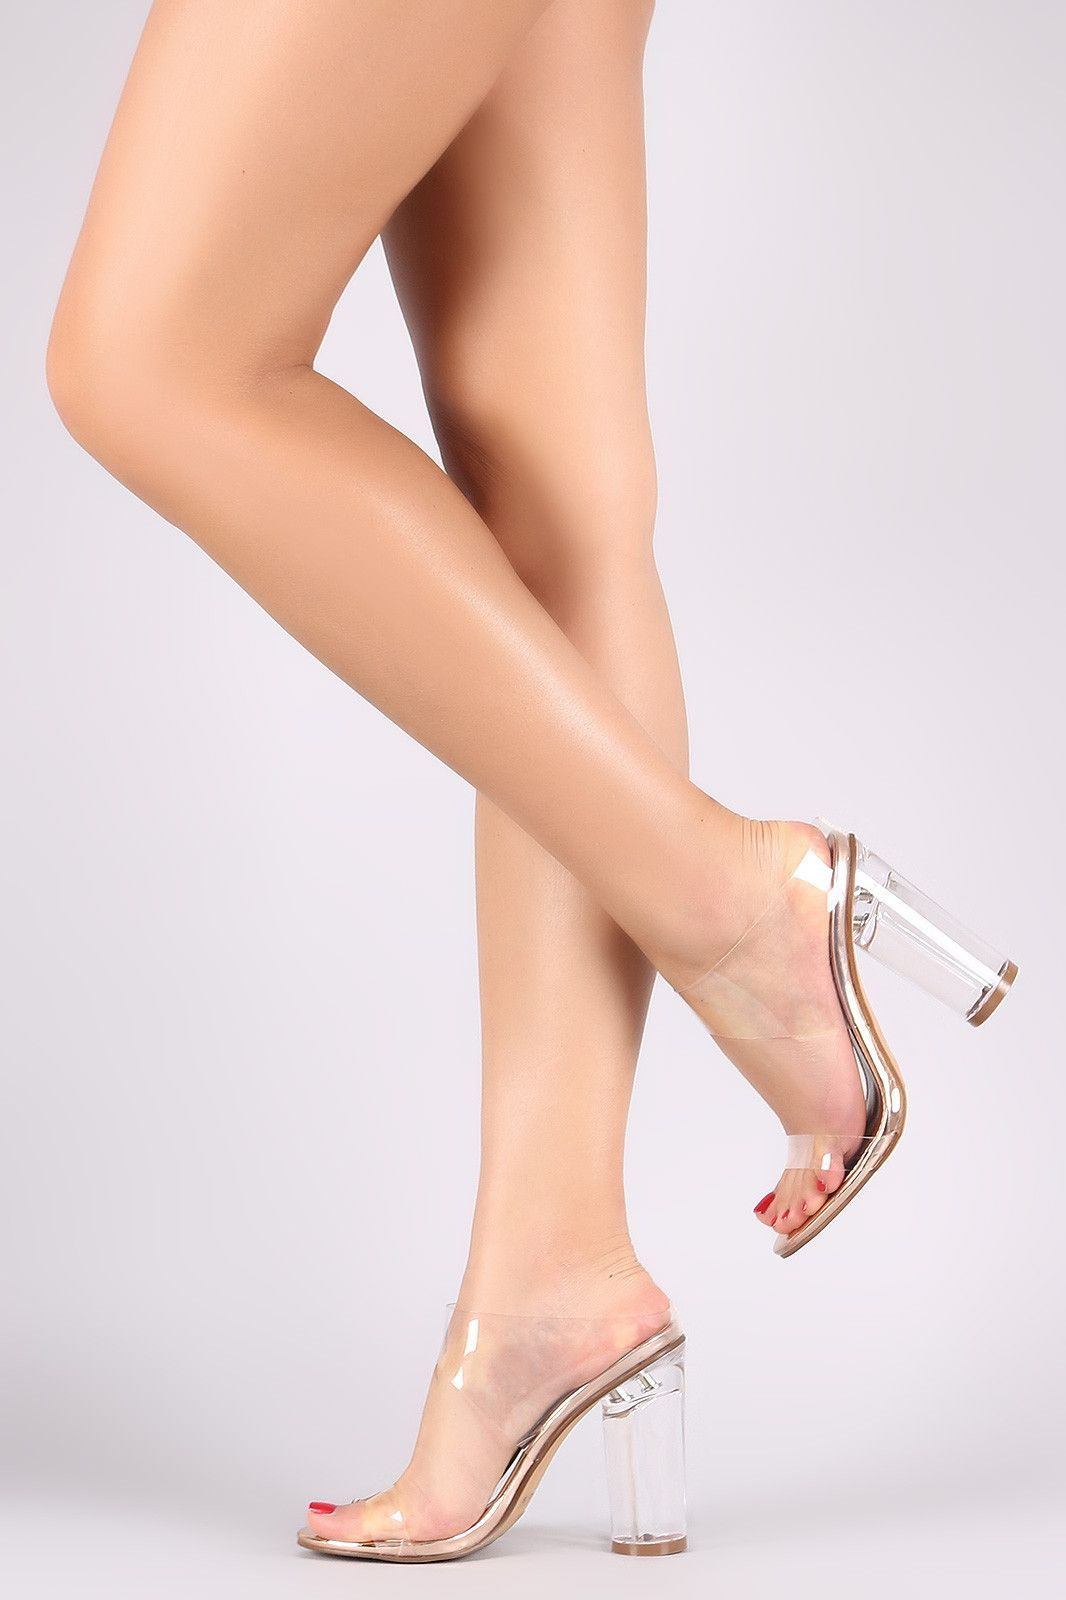 Transparent Open Toe Mule Round Perspex Heel  7xpwsuU0